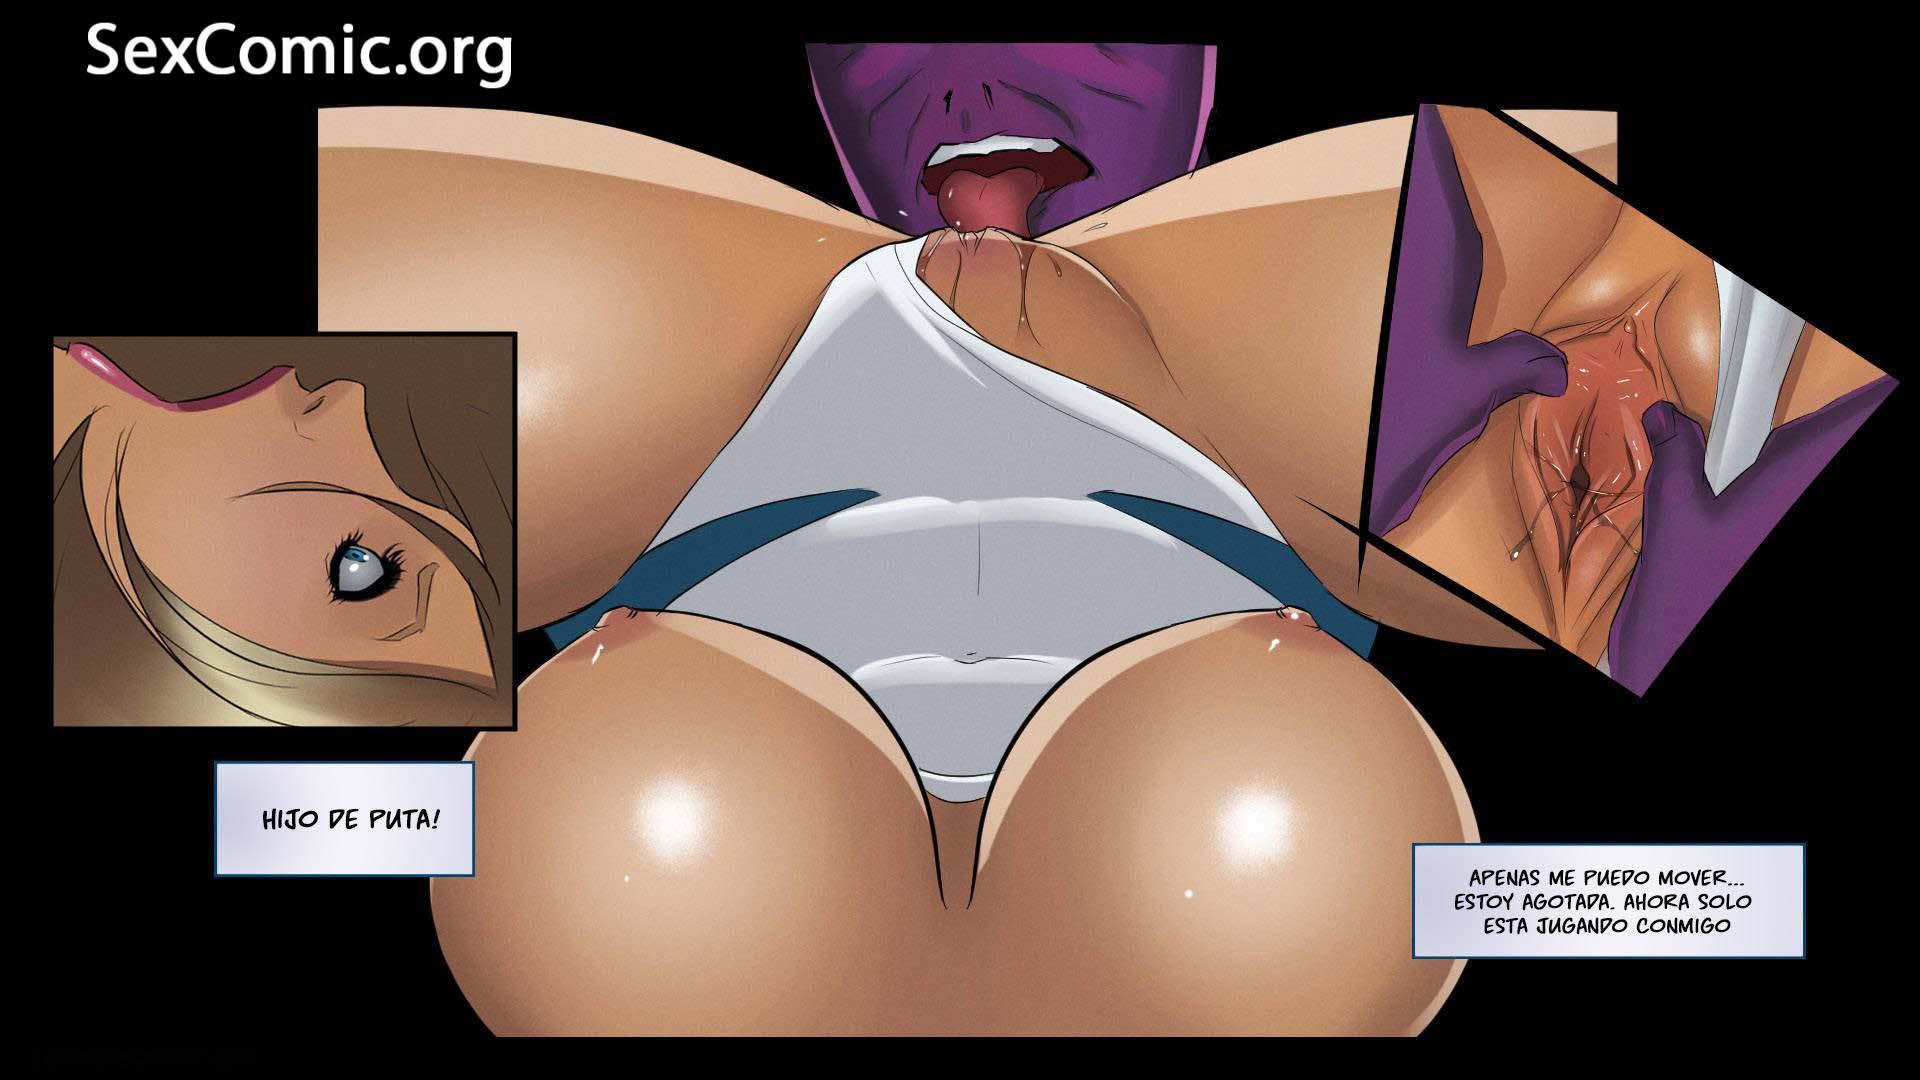 comic-marverl-xxx-atrapando-ala-famosa-powergirl-historias-eroticas-mangas-para-adultos-fantasias-sexuales-videos-incesto-comics-zoofilia-hentai-gratis-online-16